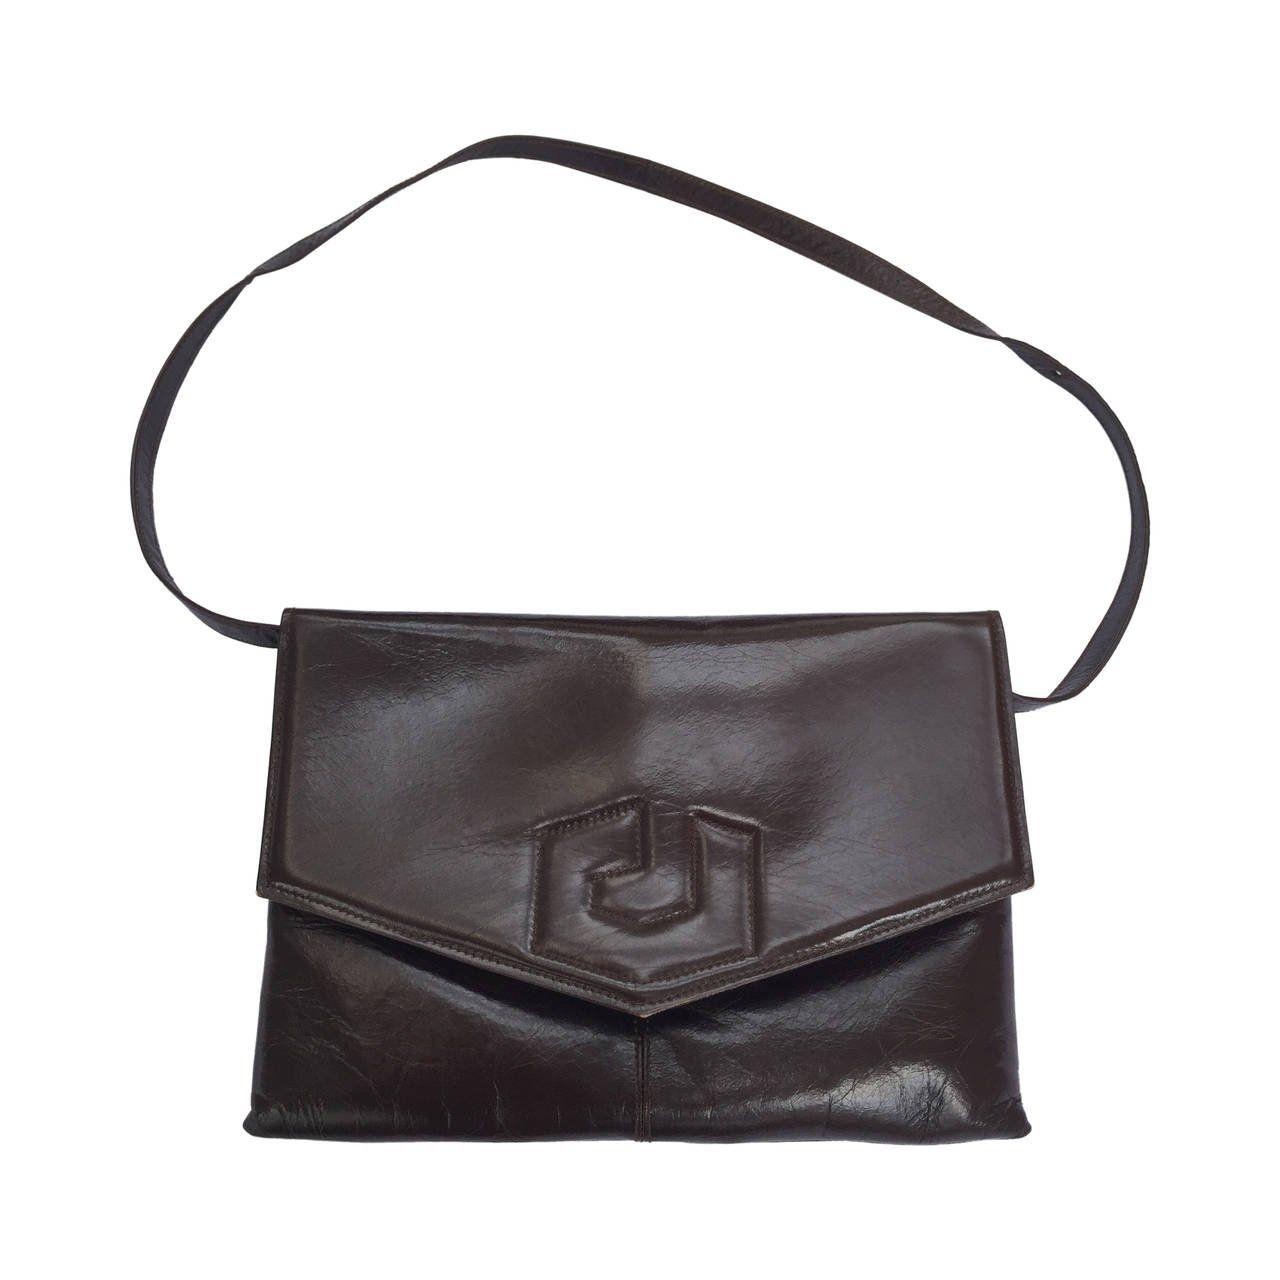 Charles Jourdan 70s Brown Leather Shoulder / Clutch Handbag a4y0ViKD5